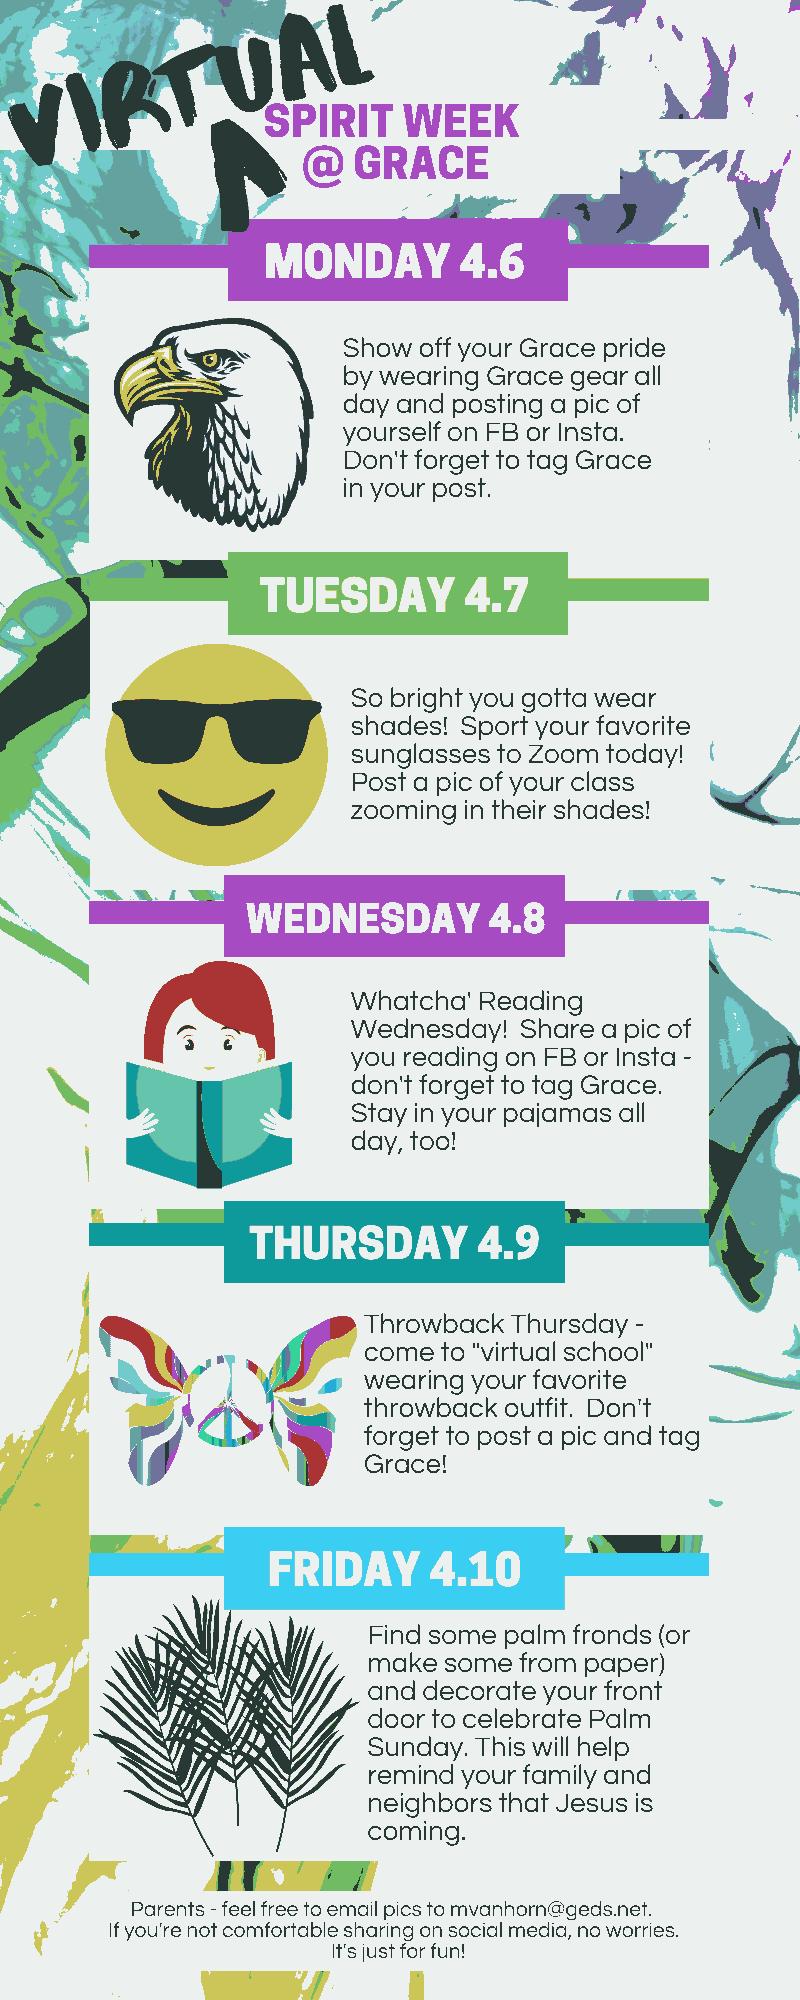 Spirit Week details